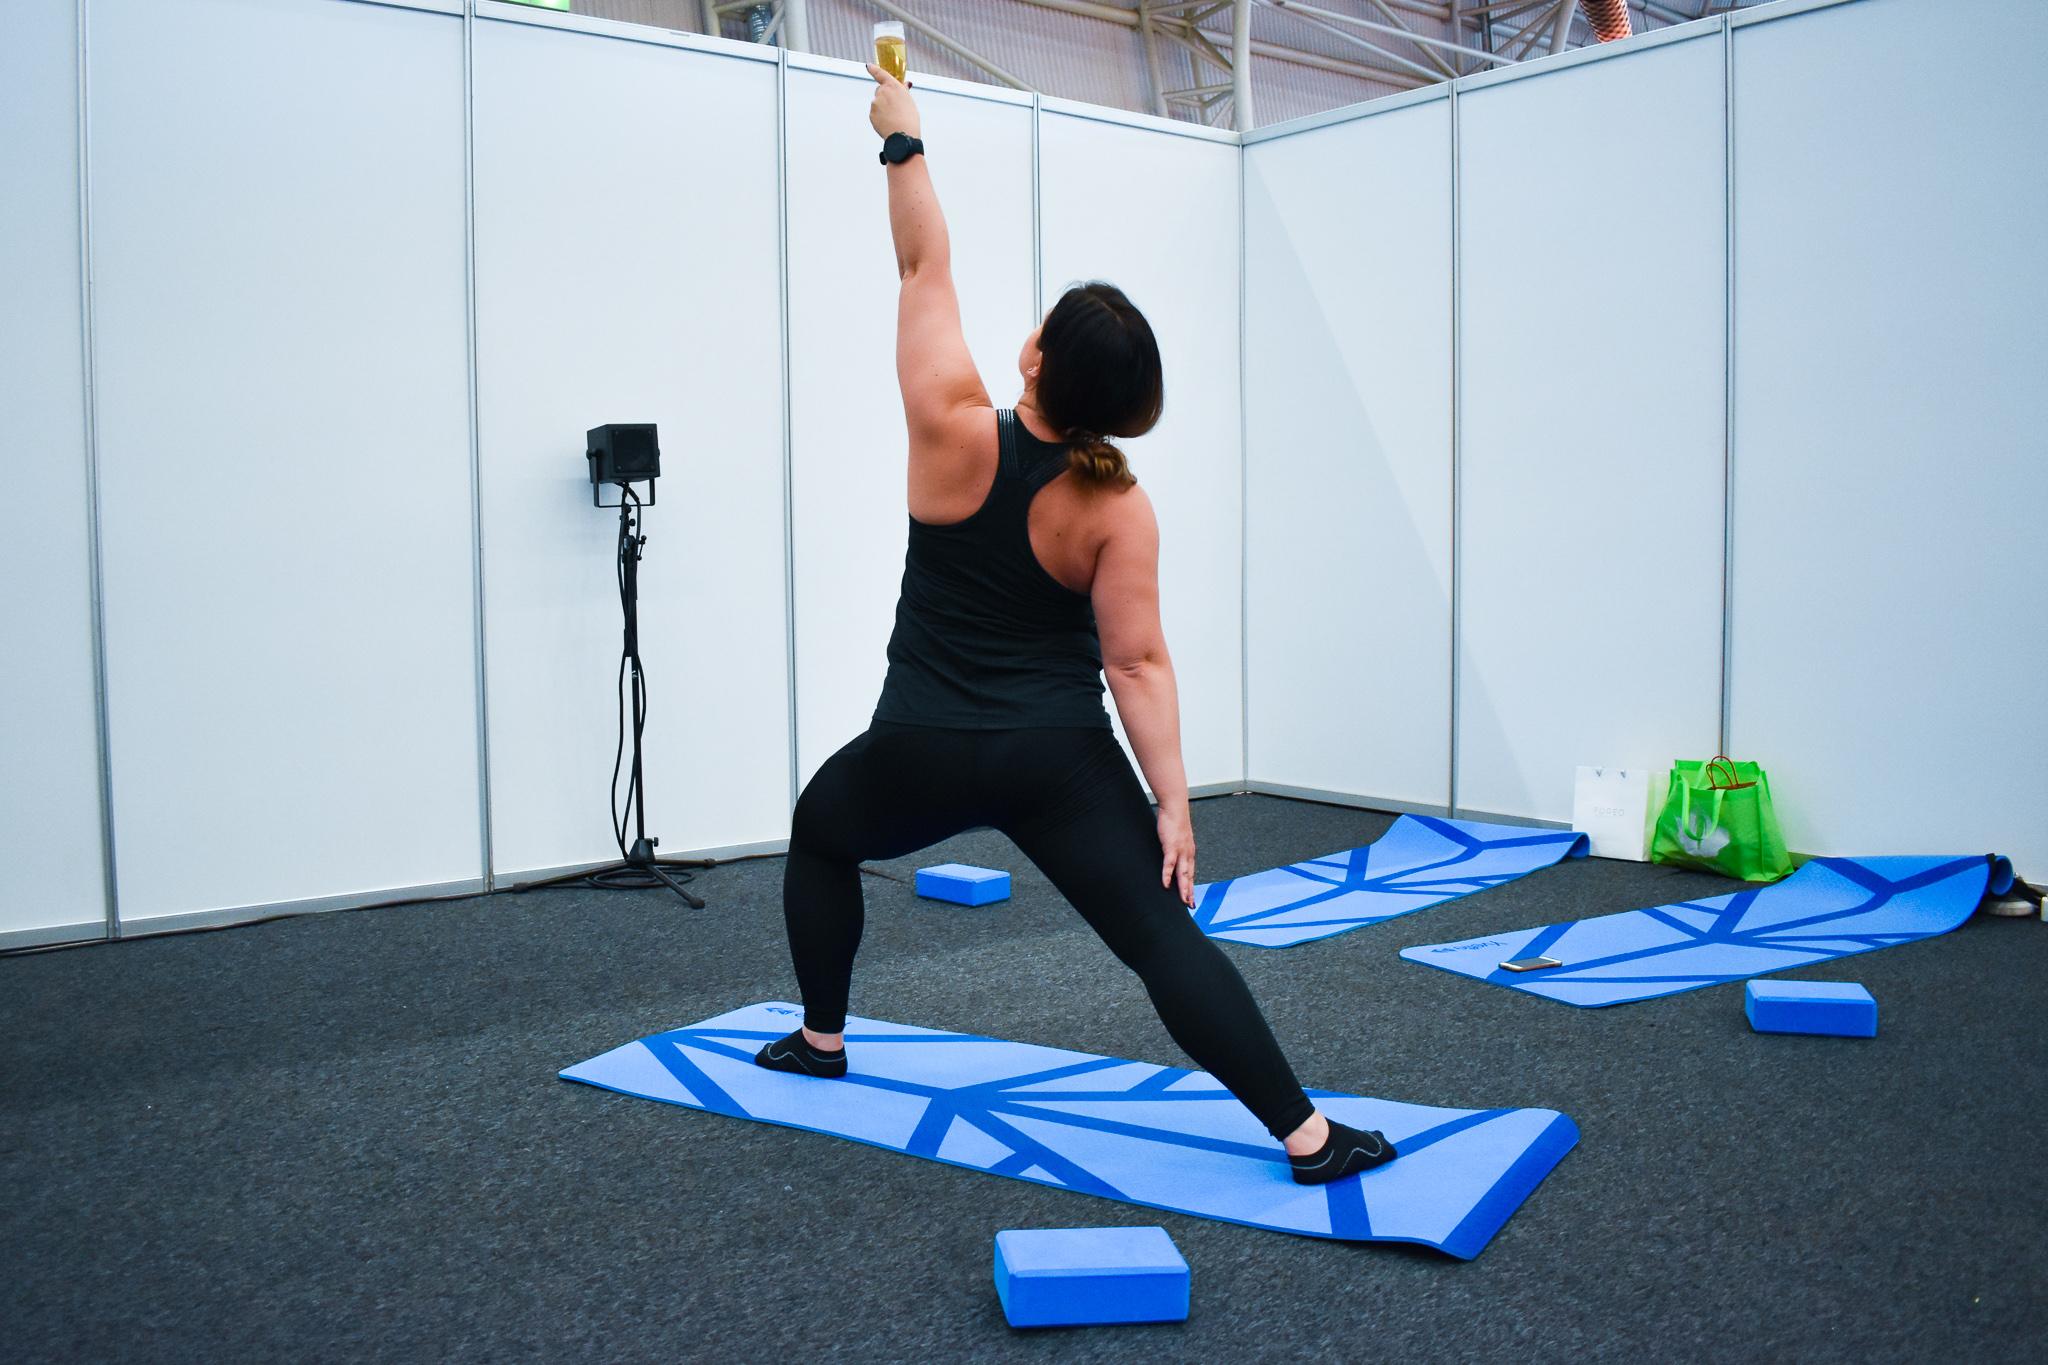 hoorayforsquats-yoga-nordic